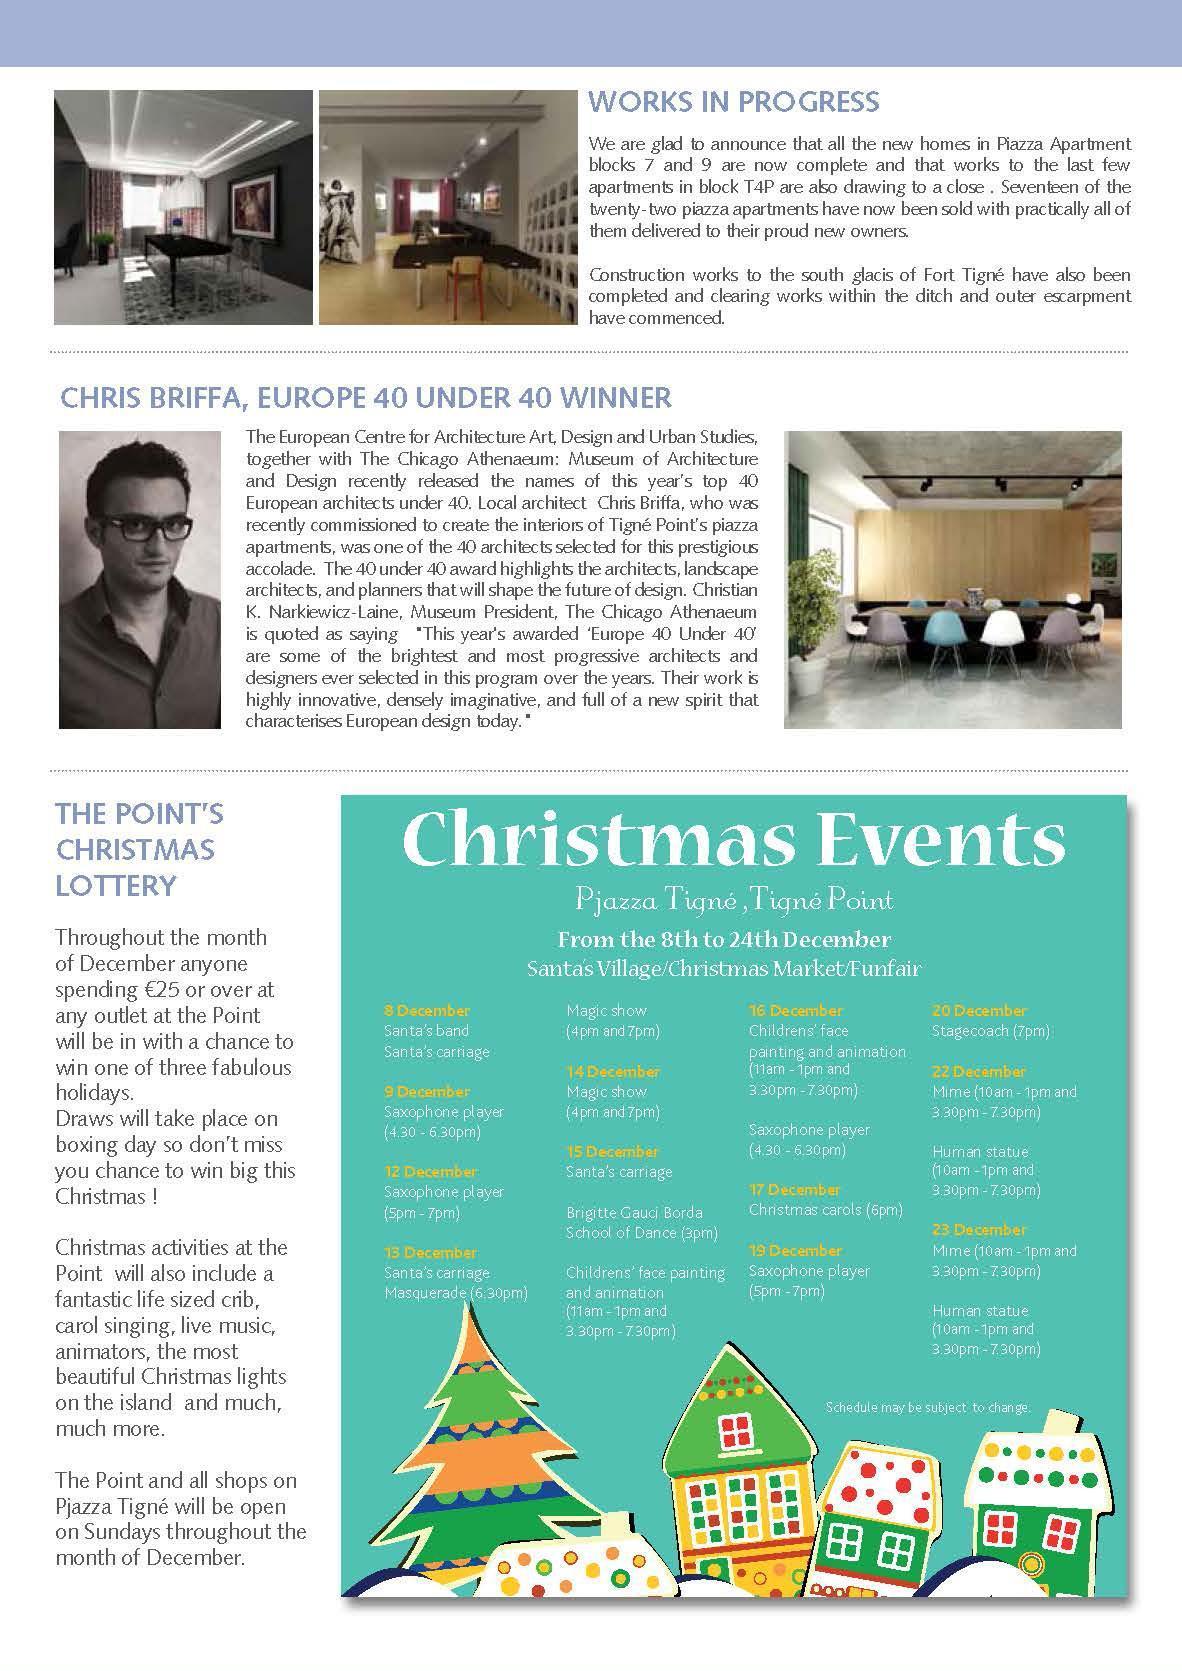 Tigné Point Newsletter December 2012